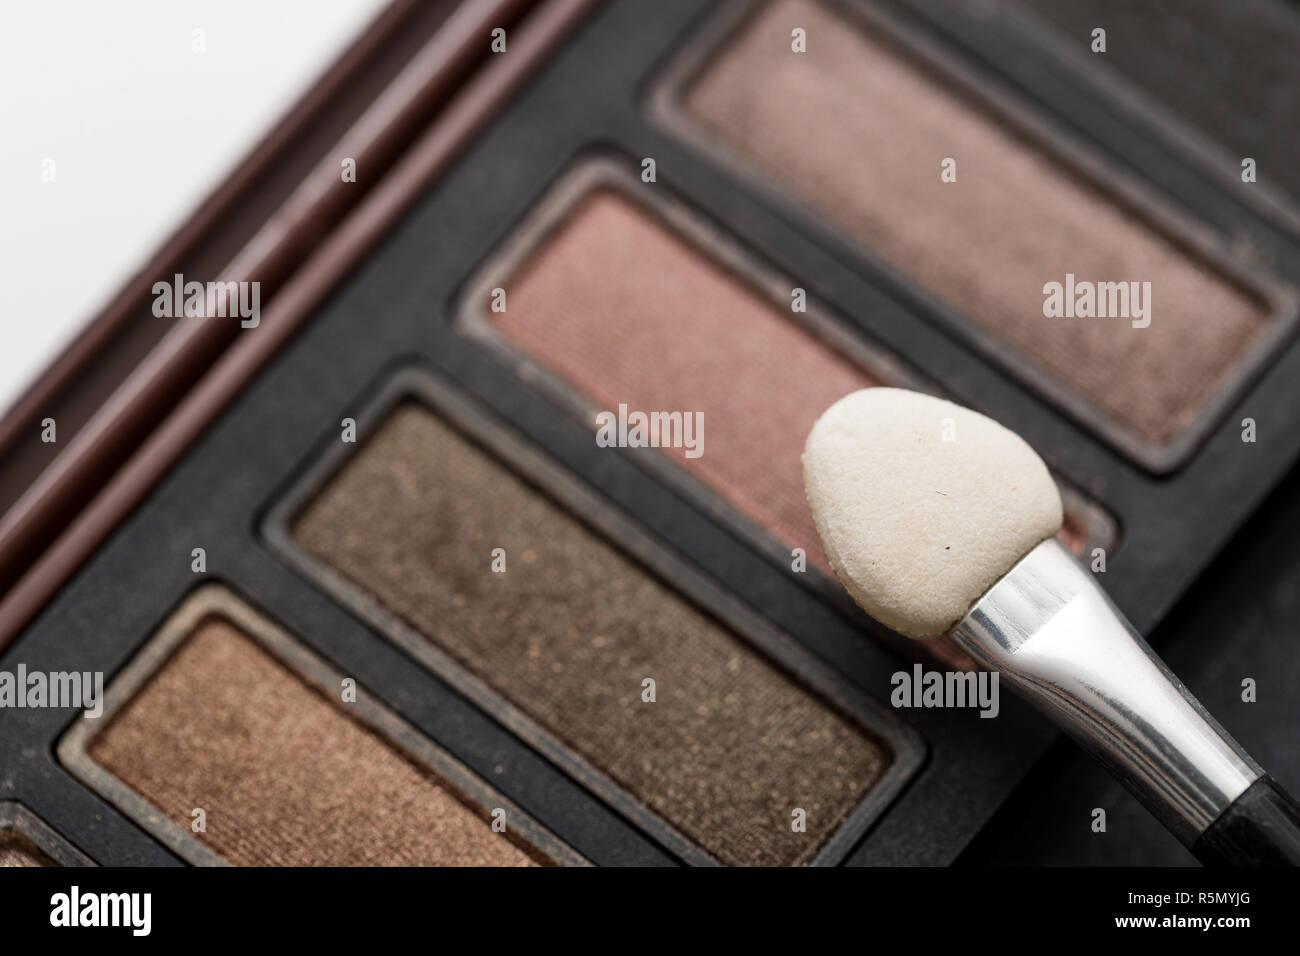 Eye Shadow Palette - Stock Image